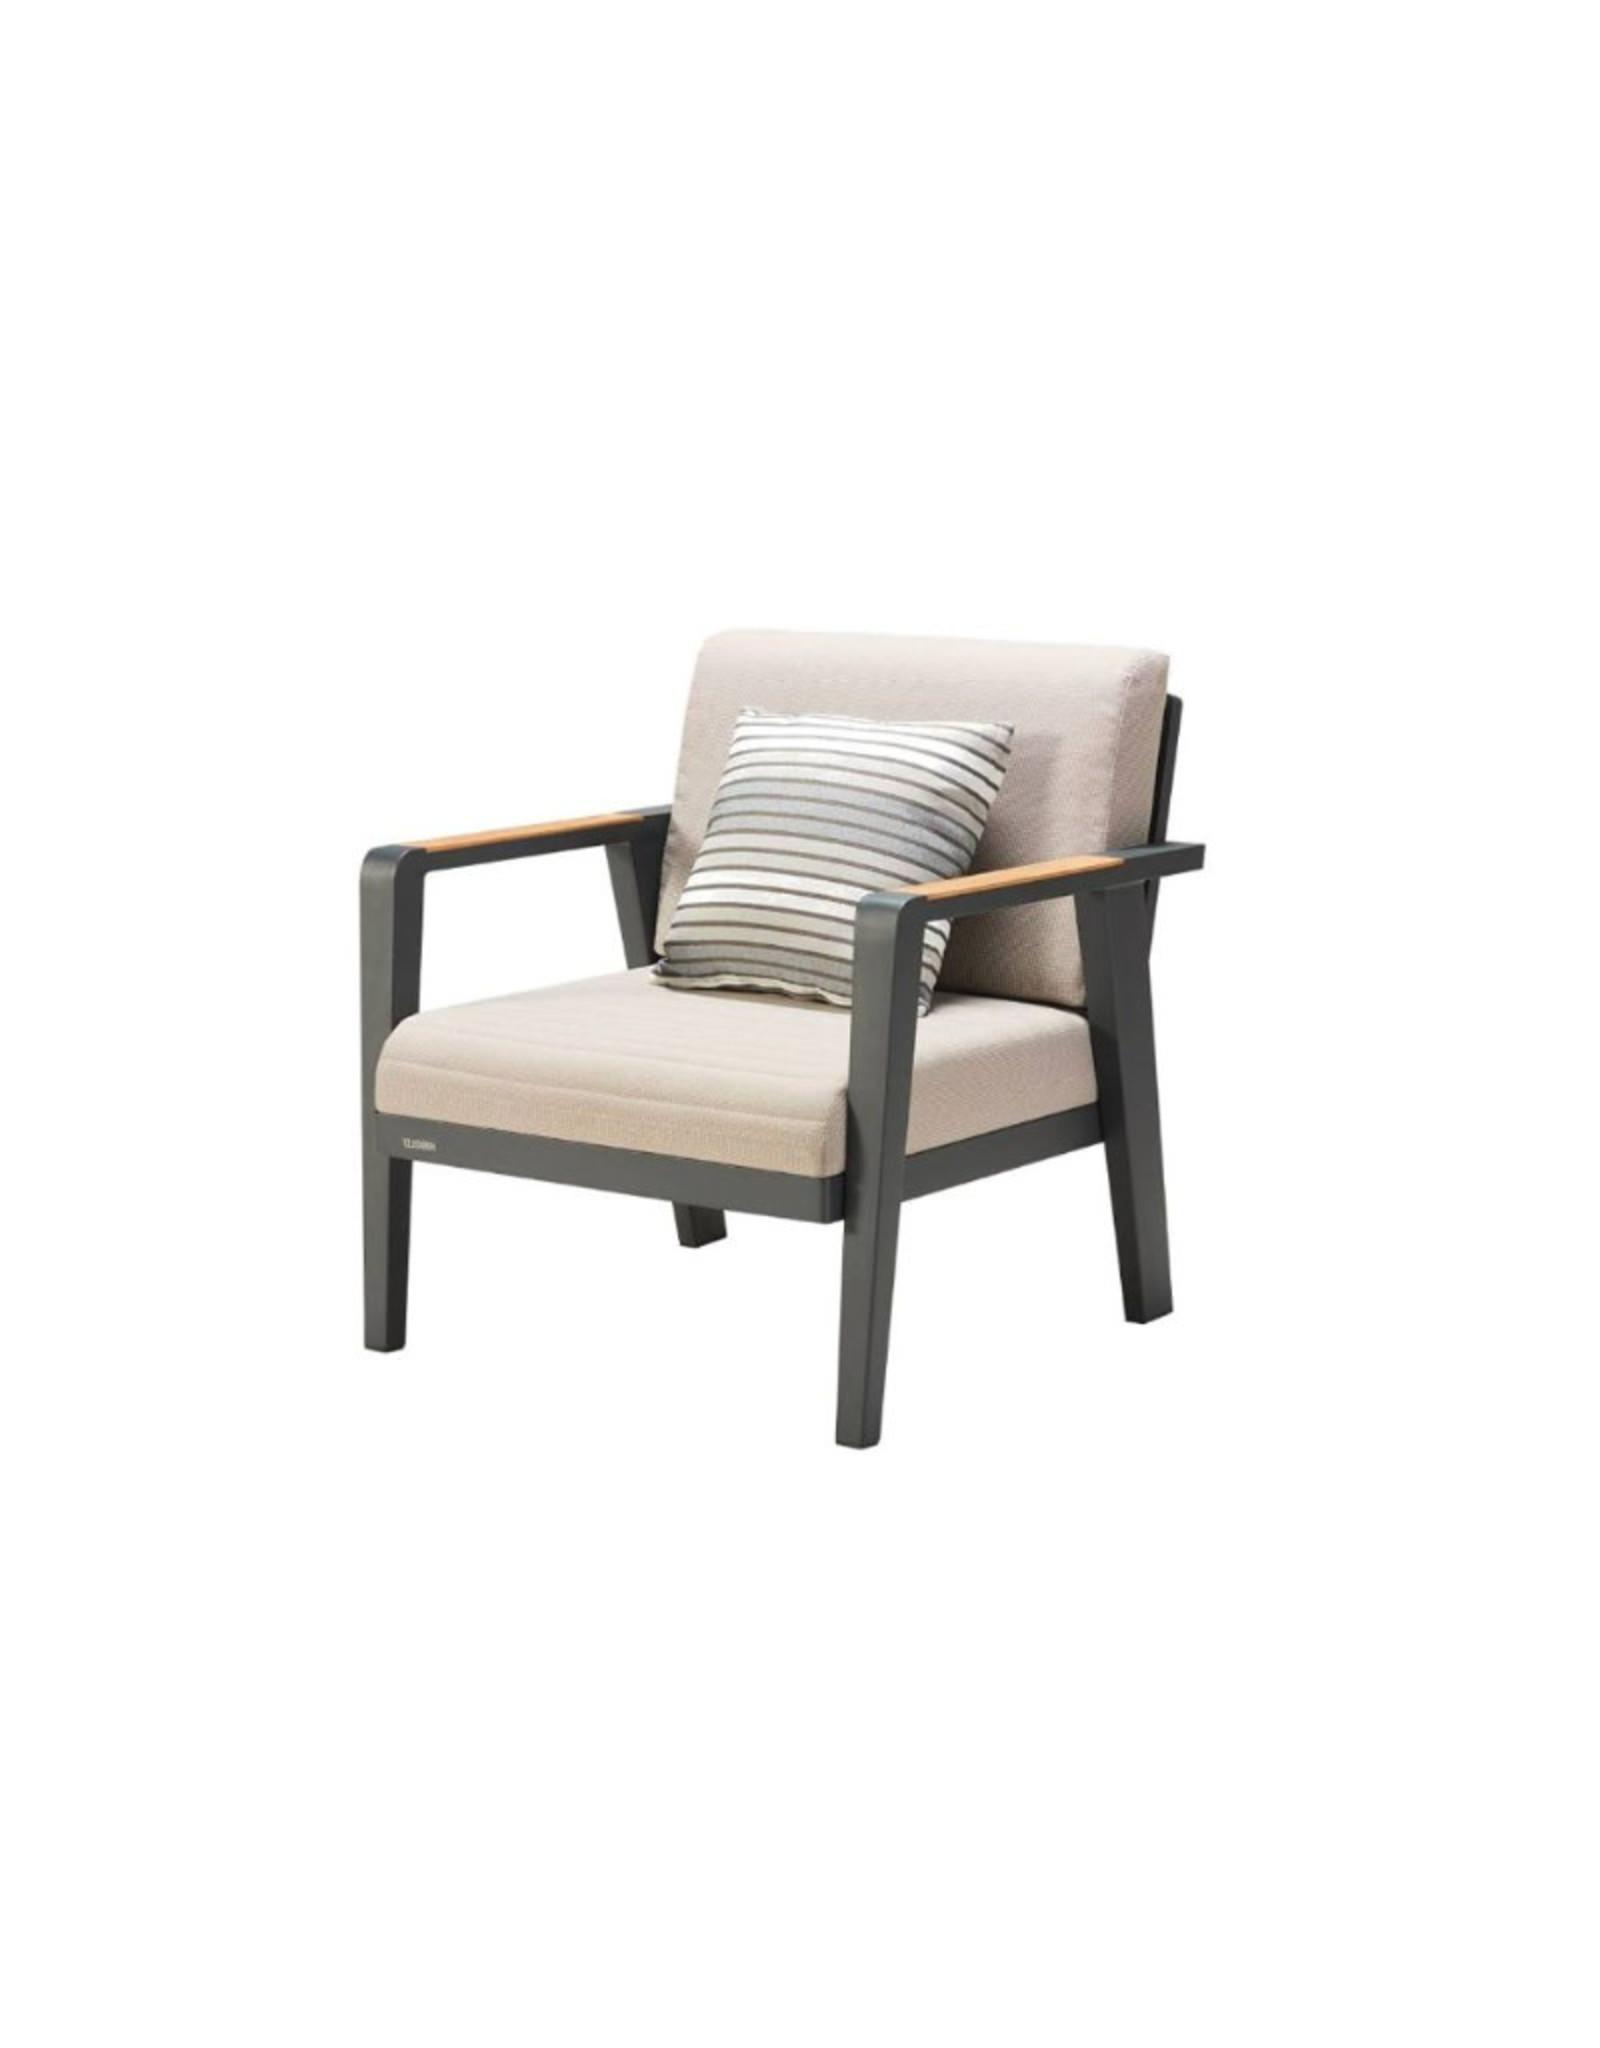 Higold Higold Emoti three seater sofa set 207cm grijs-taupe